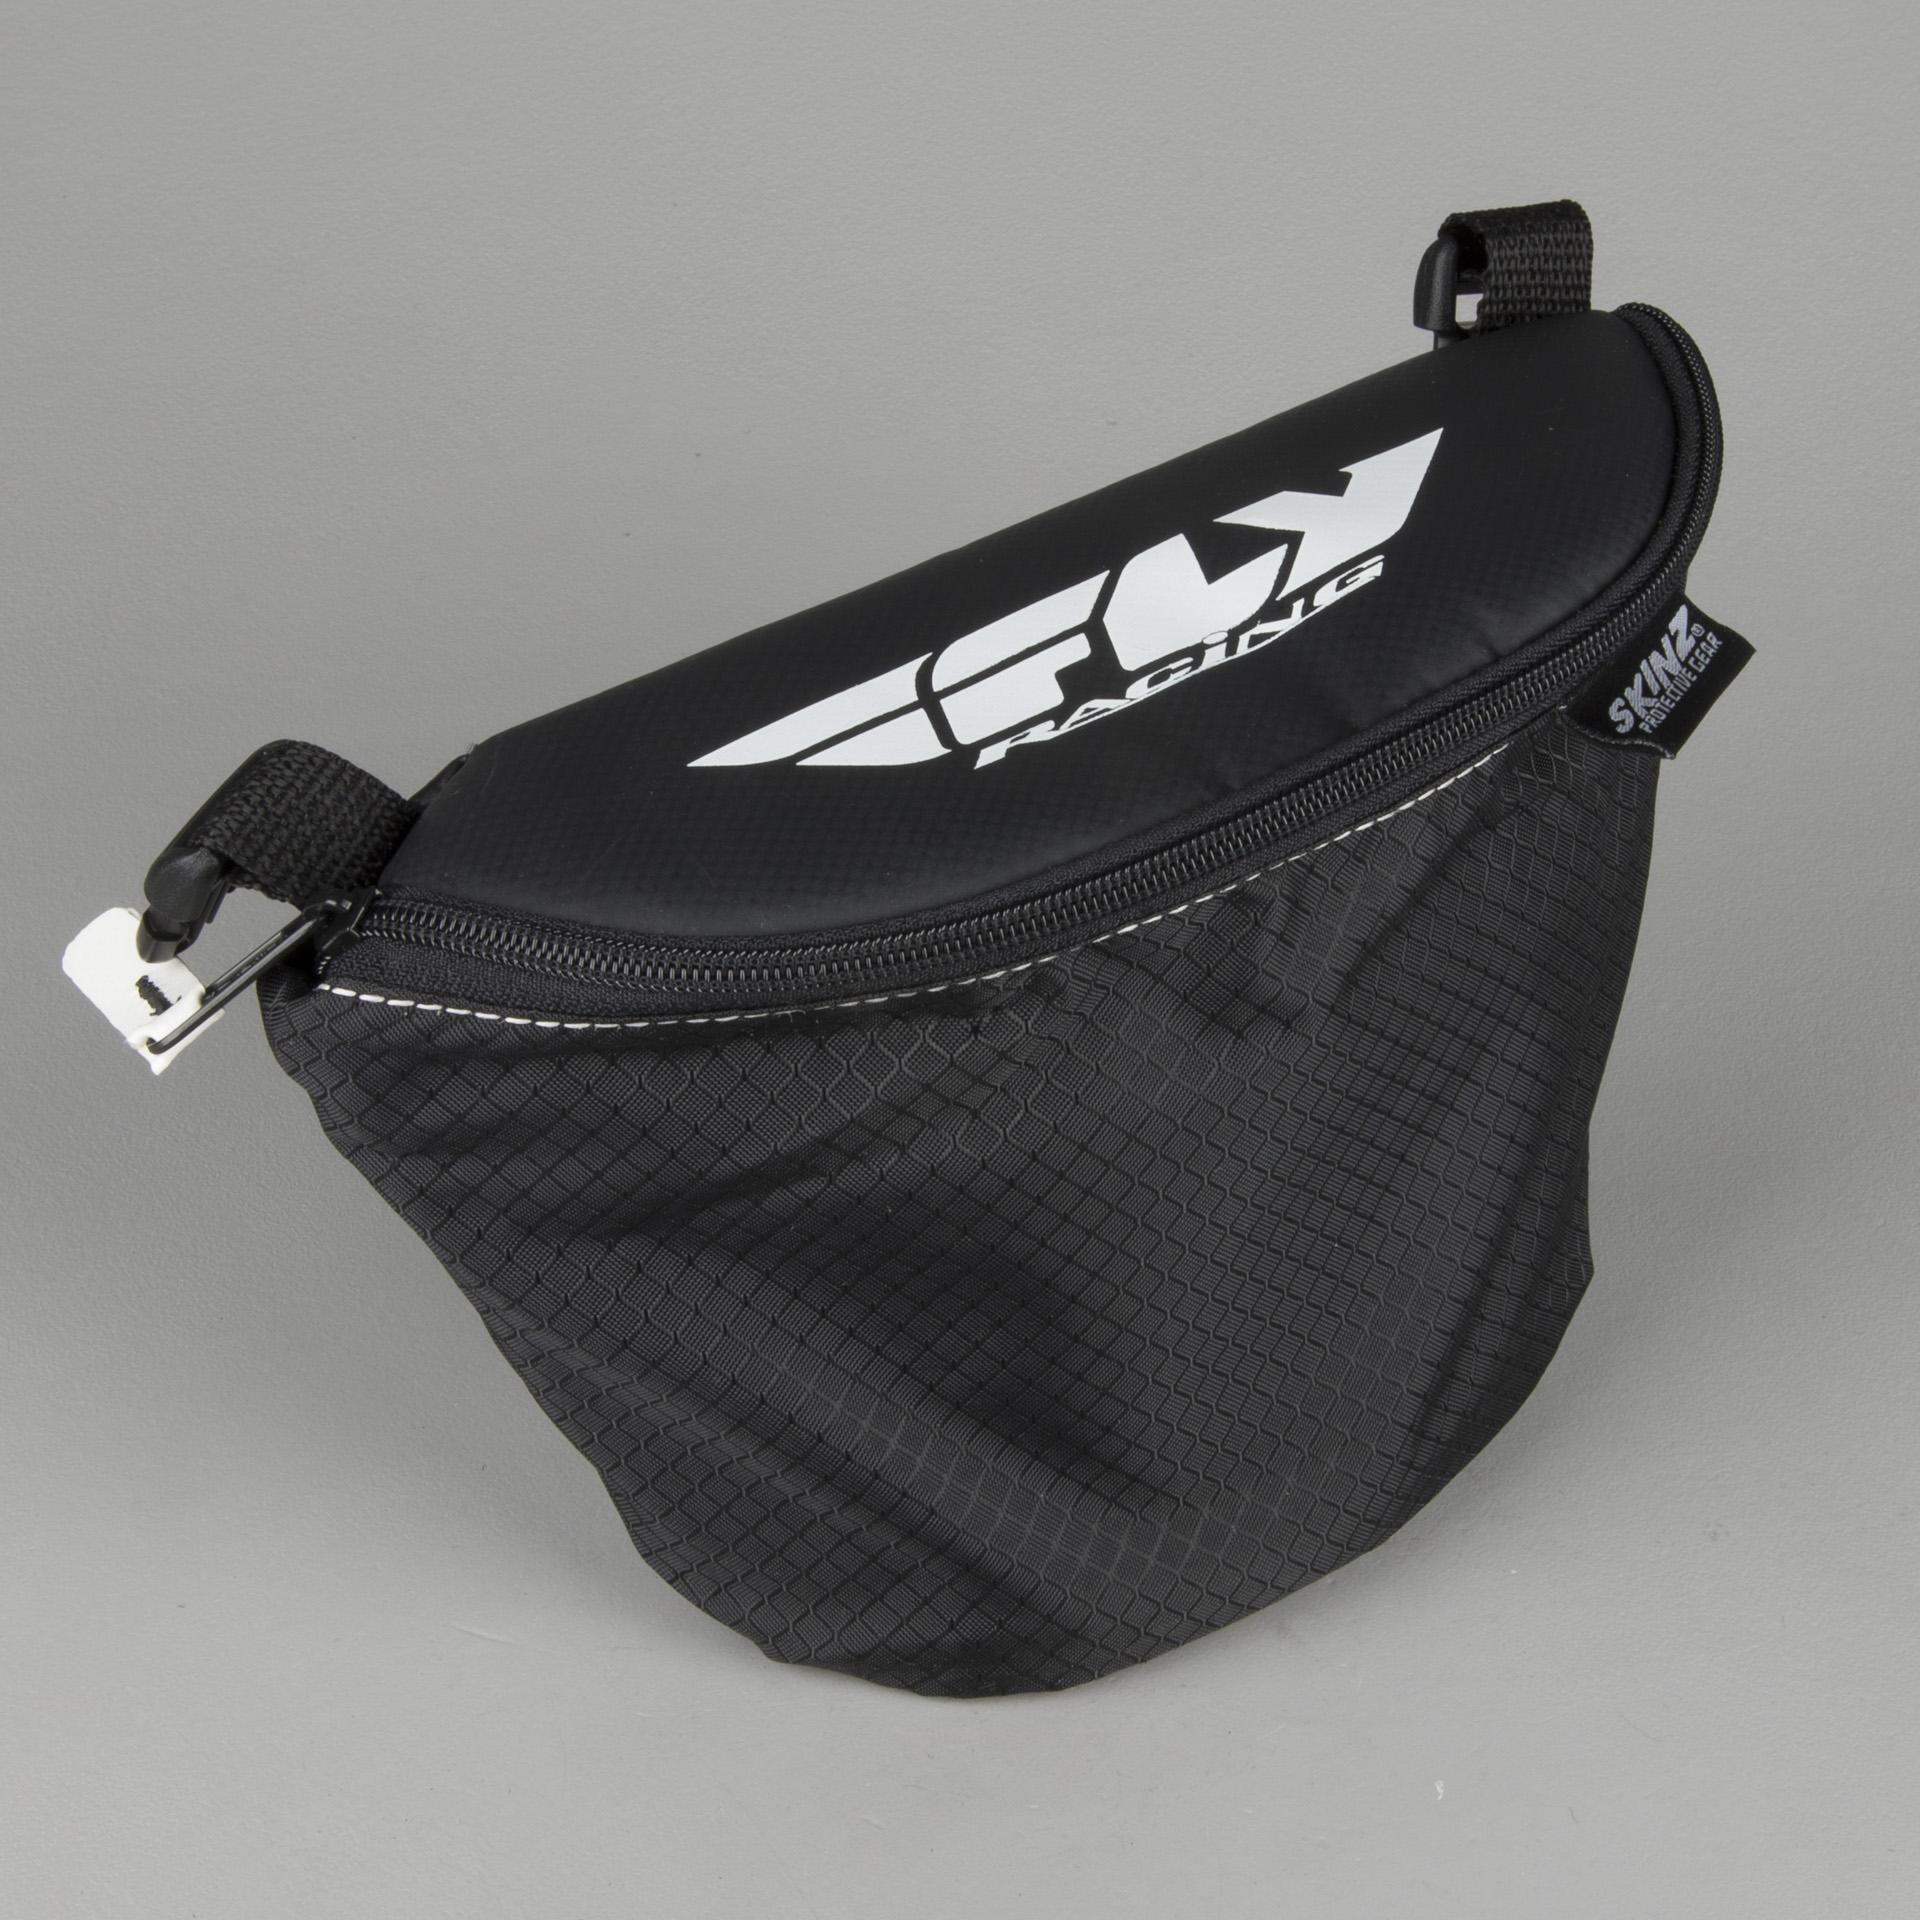 Veske RSI Underhood Bag Ventilert Laveste prisgaranti